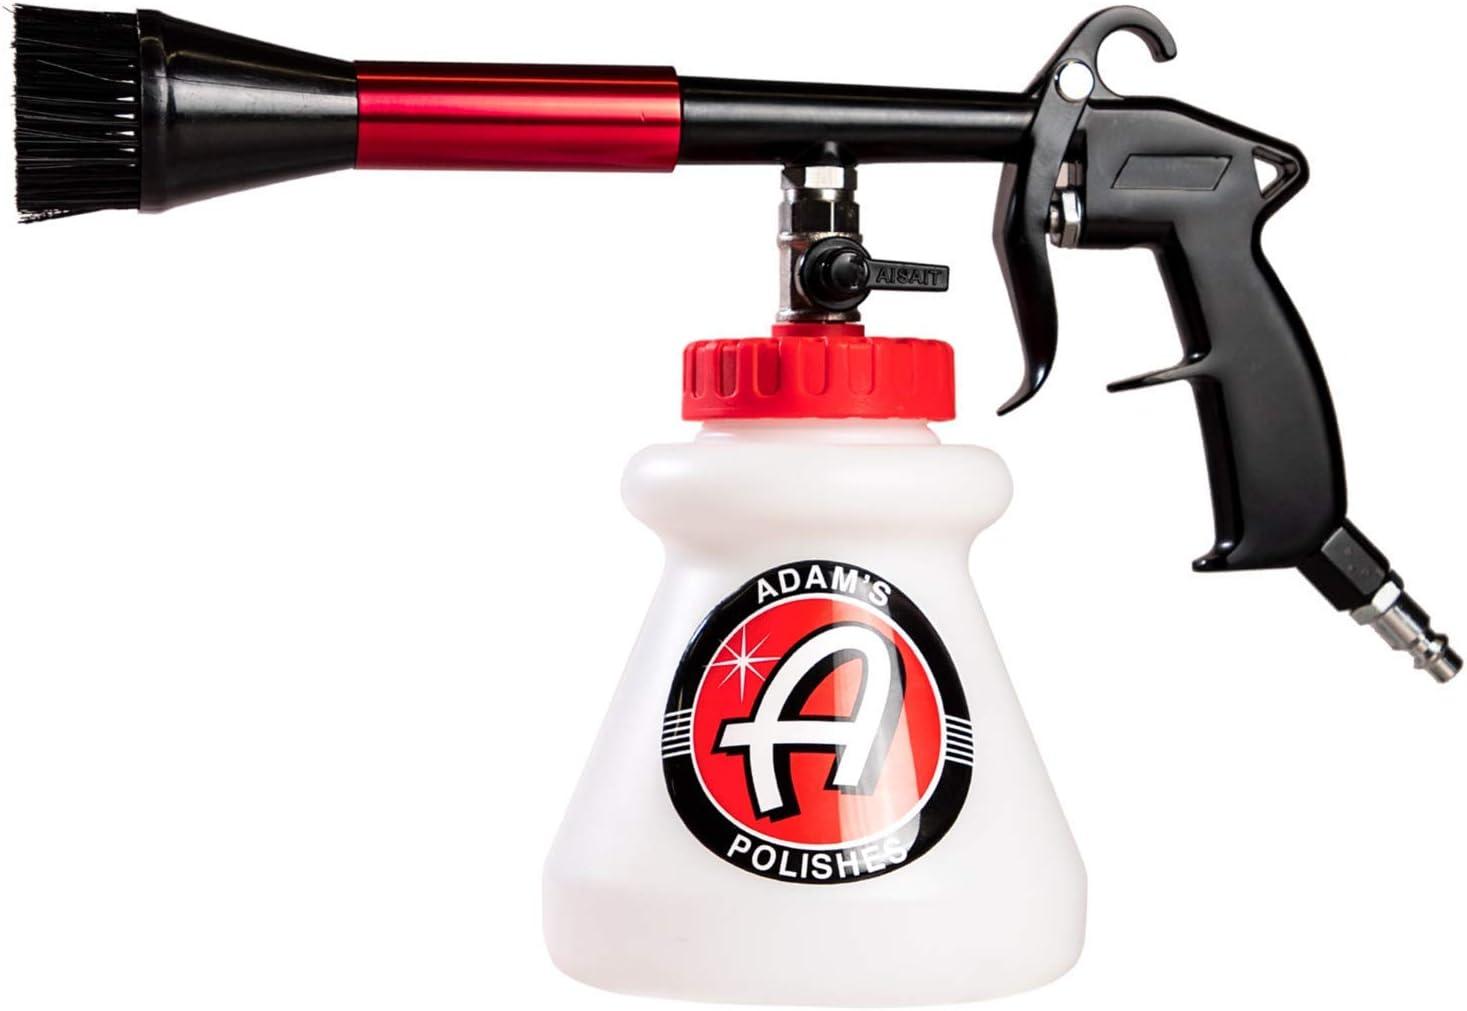 Dry Air Gun Car Truck Dry Cleaning Gun Pneumatic Spray dirt Washing Accessory